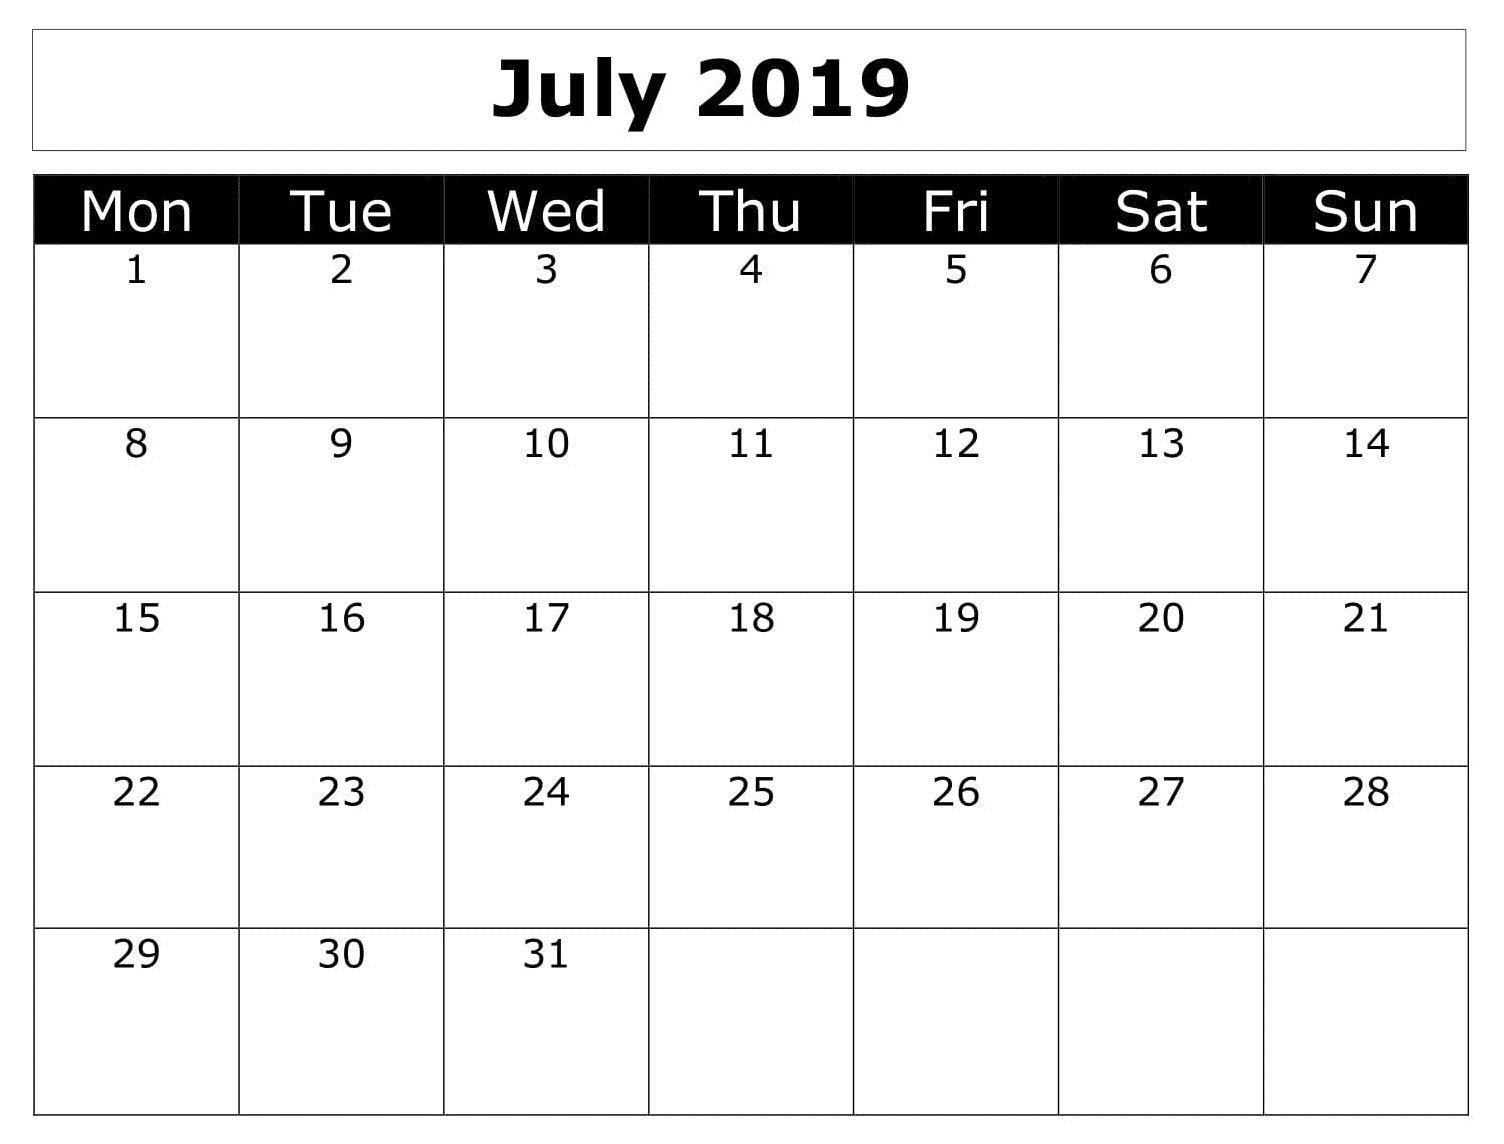 Calendar Printable July 2019 Word | Calendar July 2019 | July Calendar 2019 Word